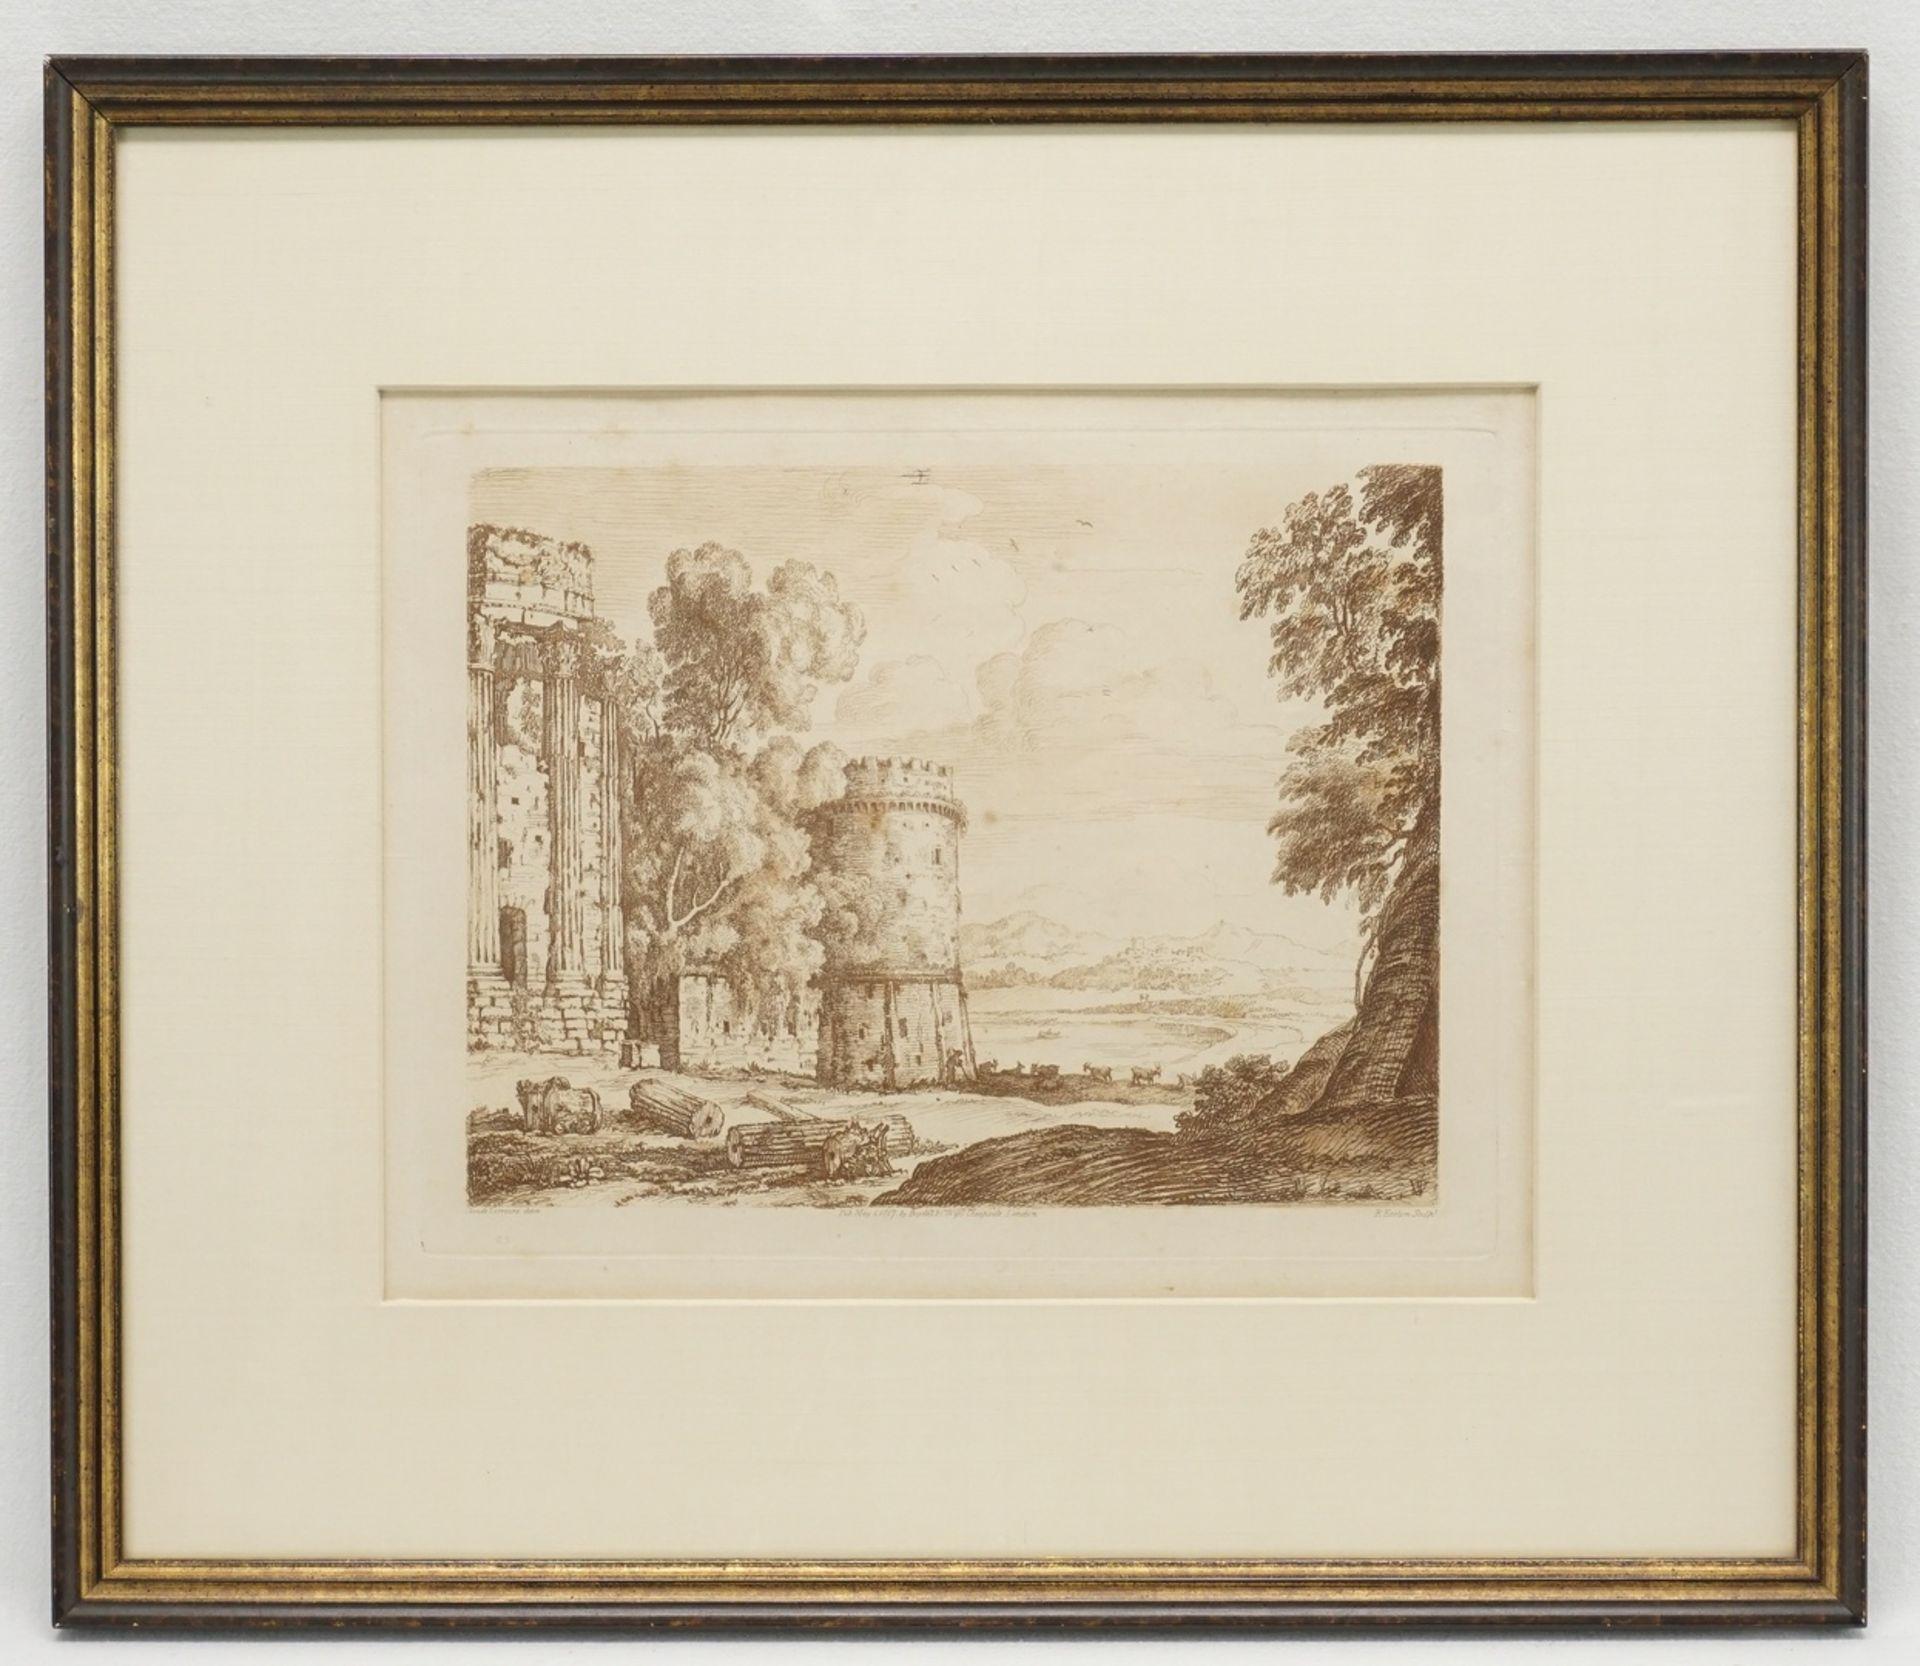 Richard Earlom, Ruinenlandschaft nach Claude Lorrain - Bild 2 aus 2